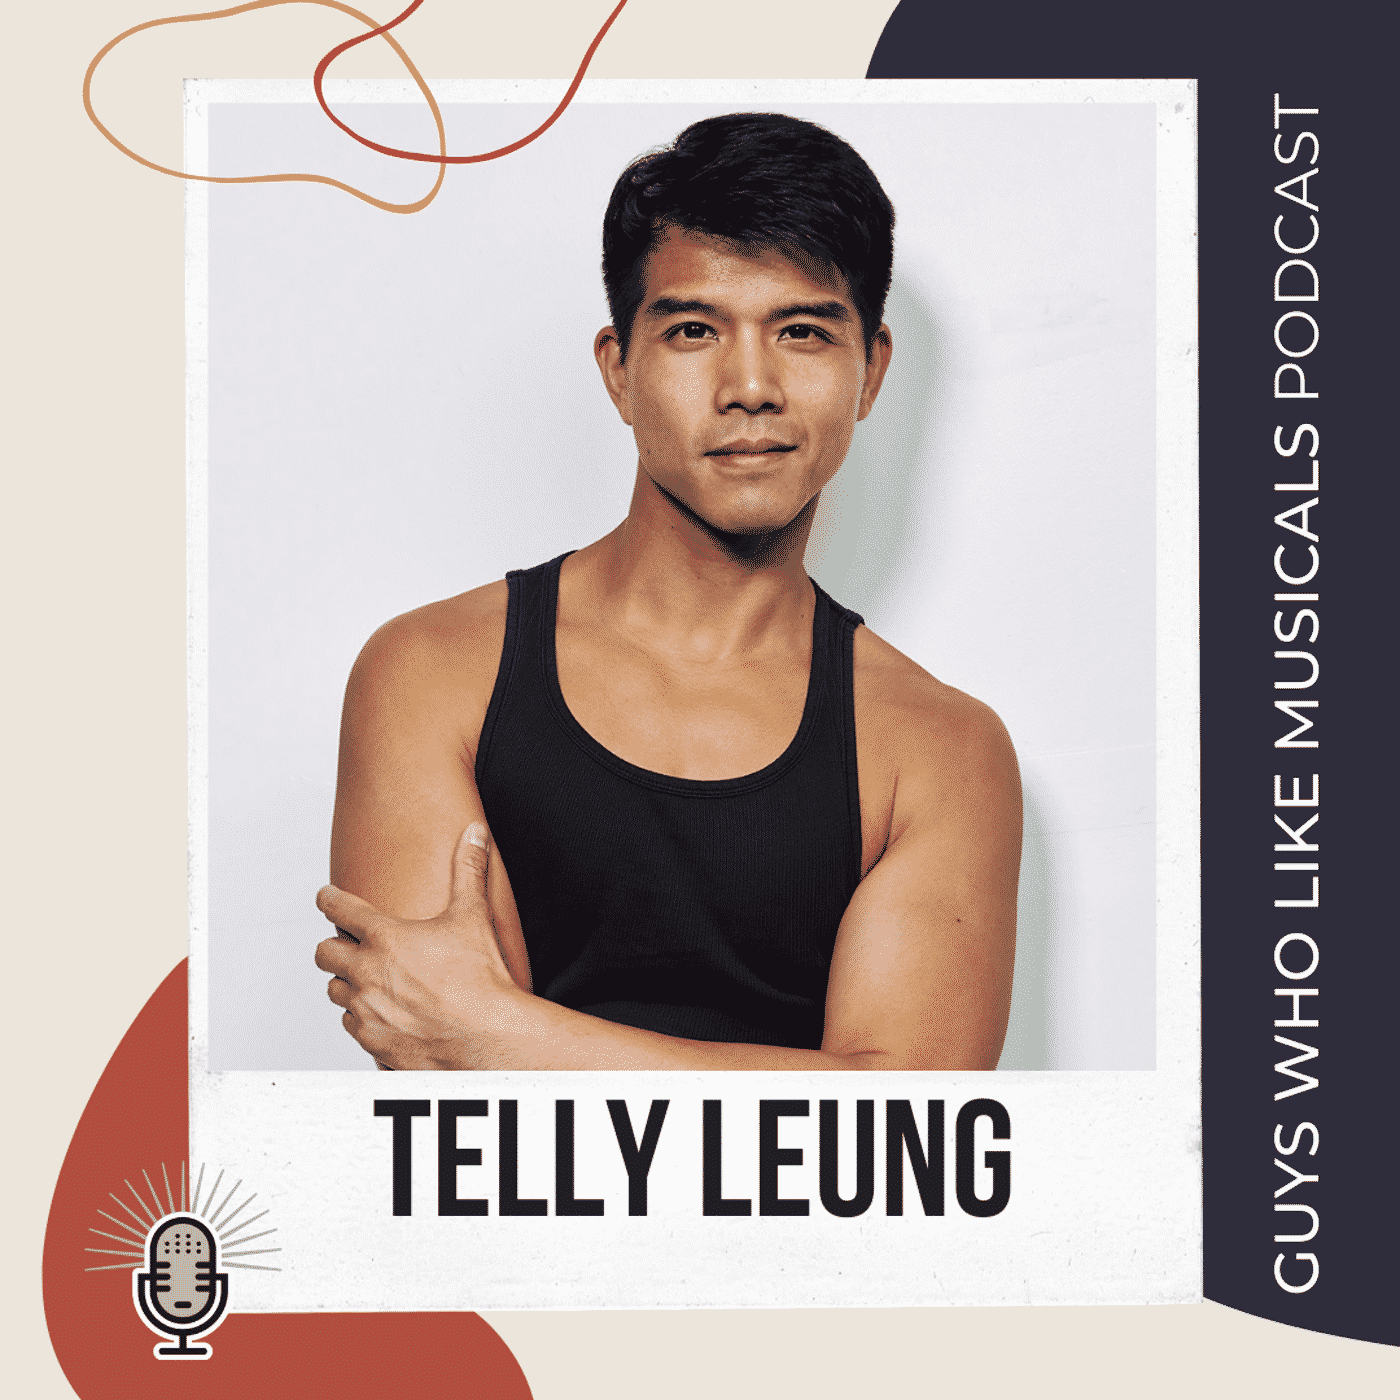 We Love Telly Leung